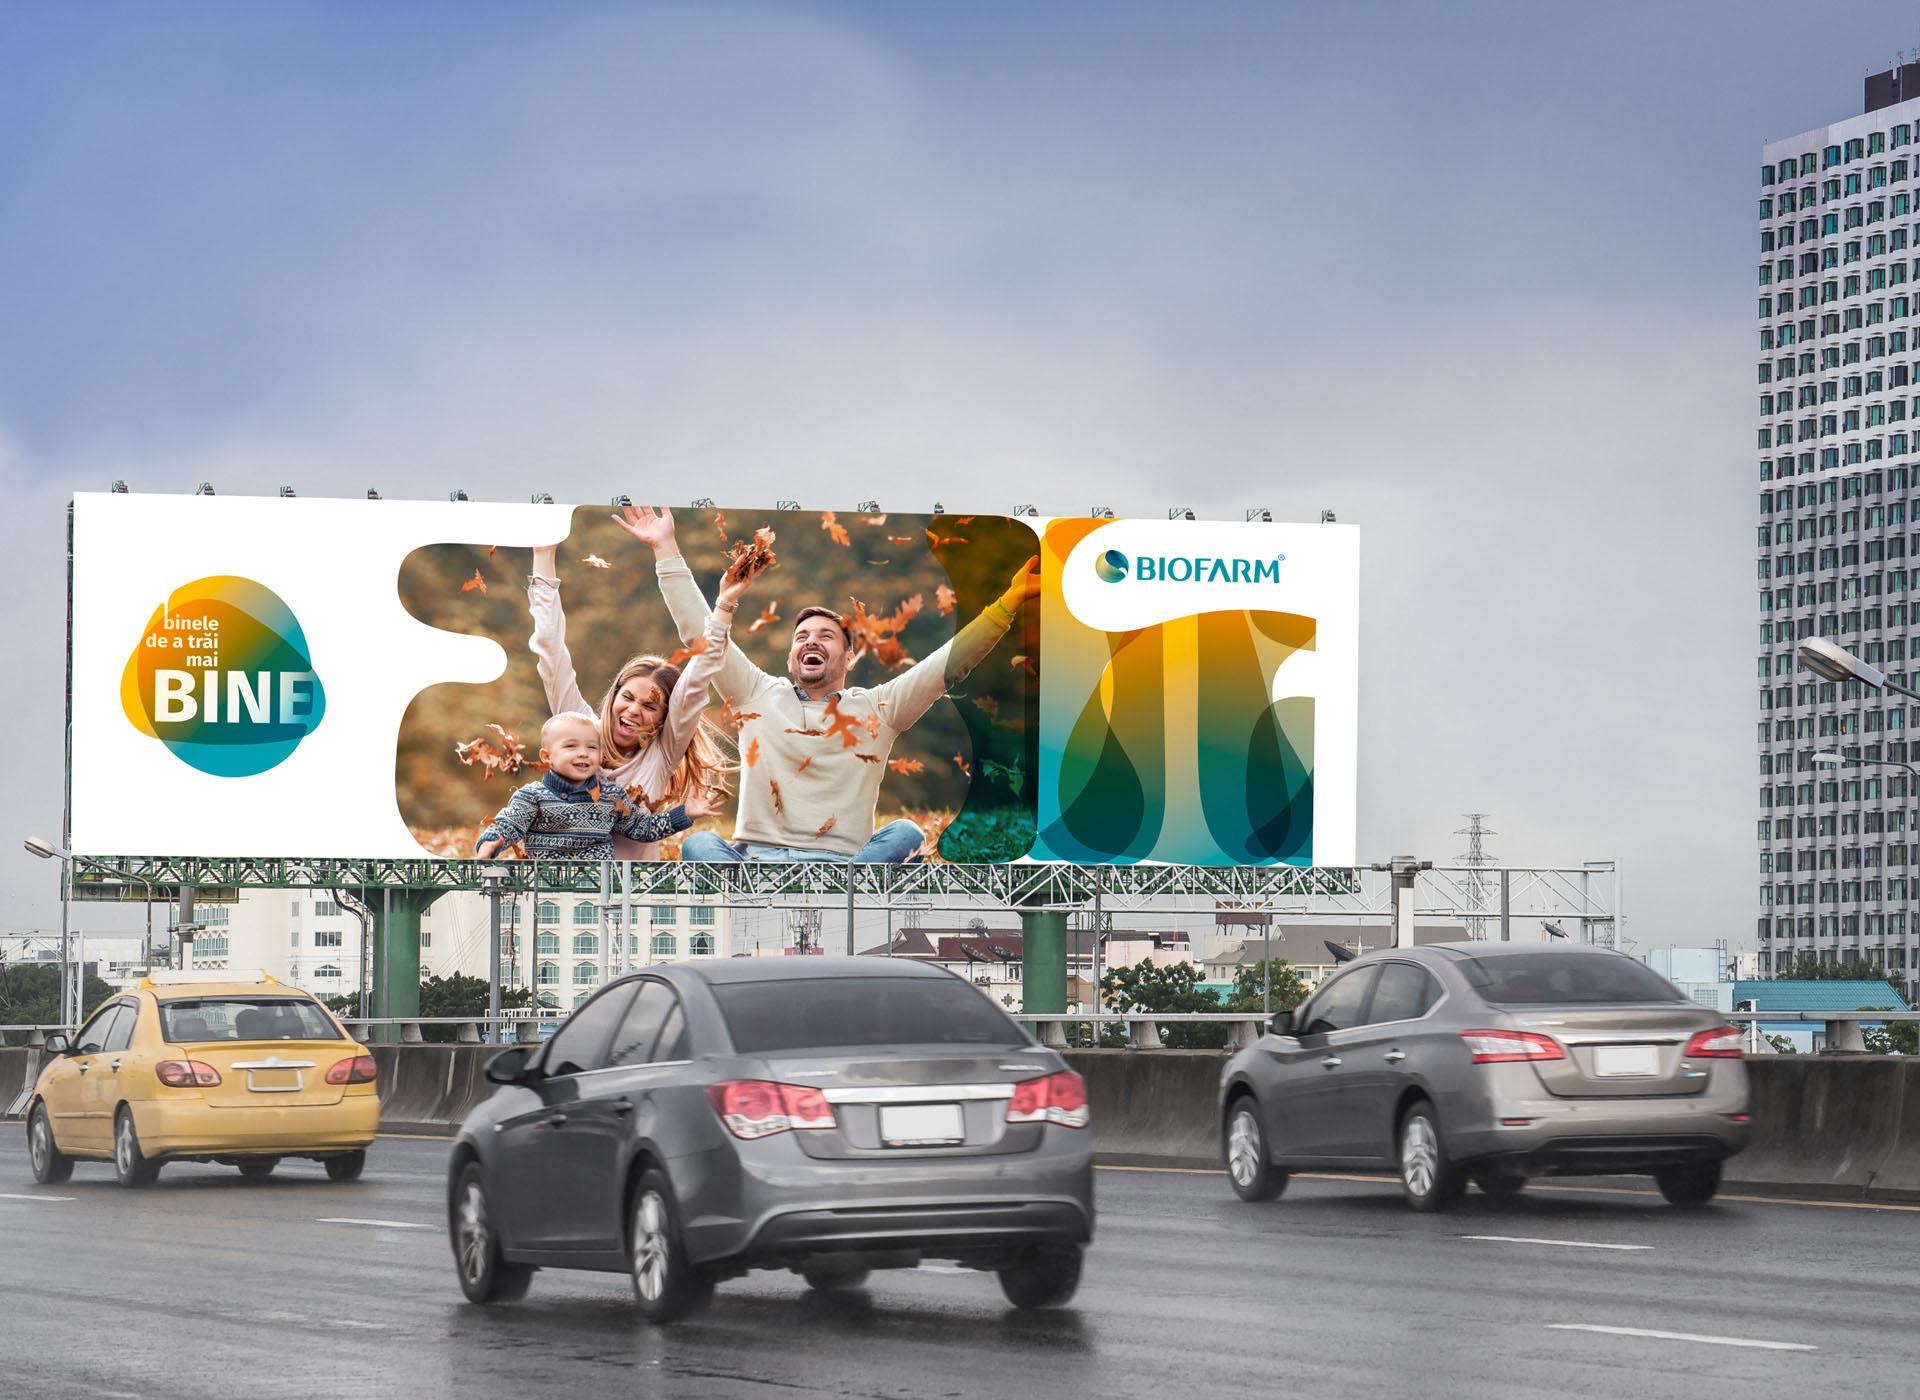 Biofarm portofoliu inoveo billboard